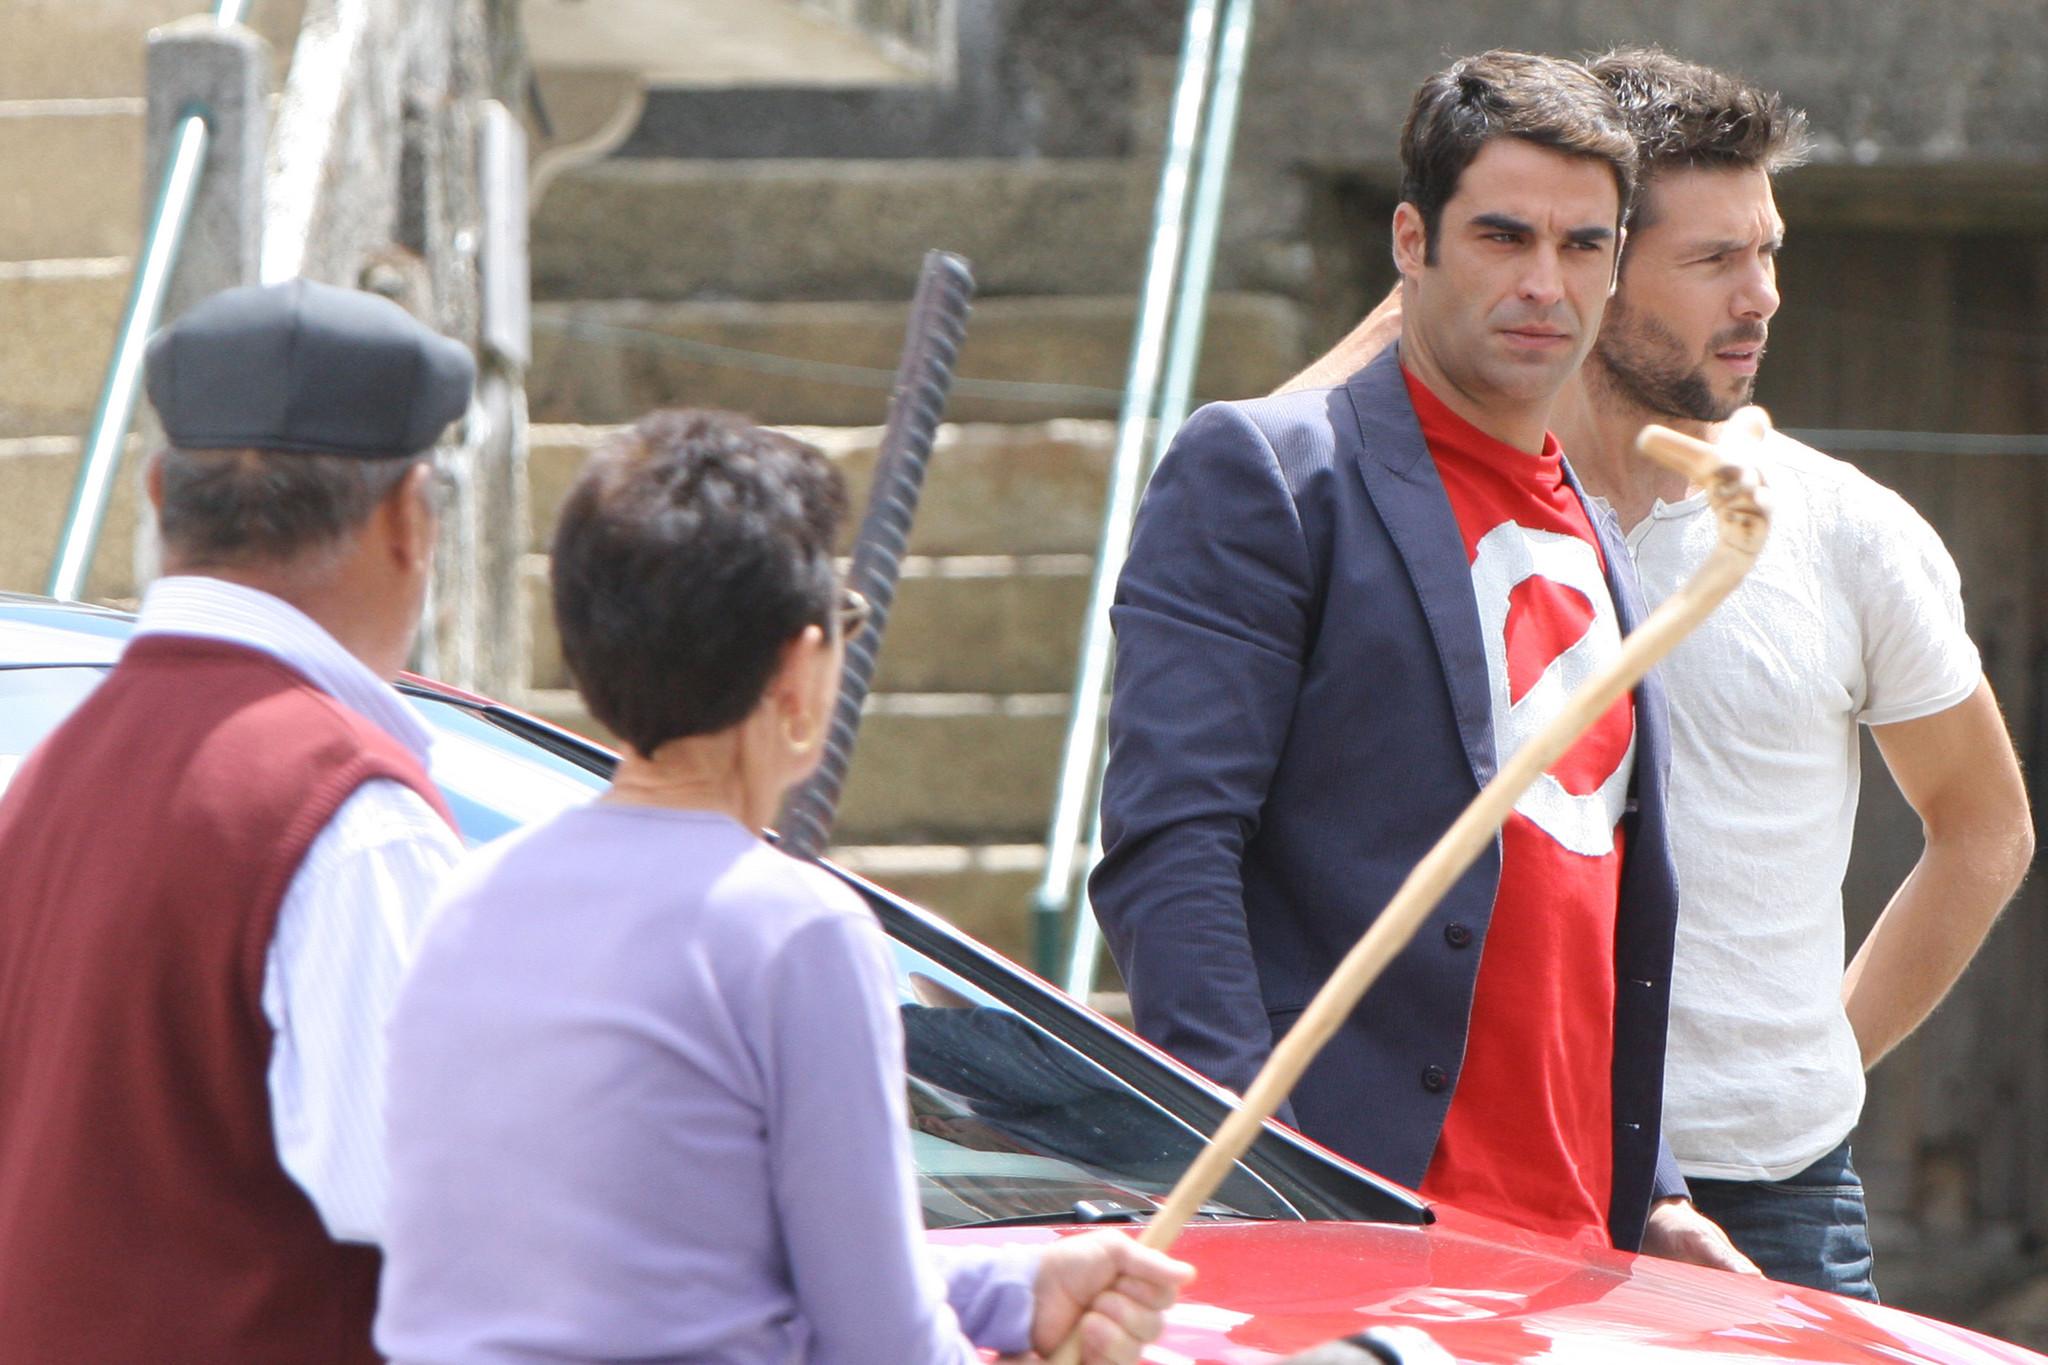 TVMAIS07072011SERGIOQUEIROS000002.JPG